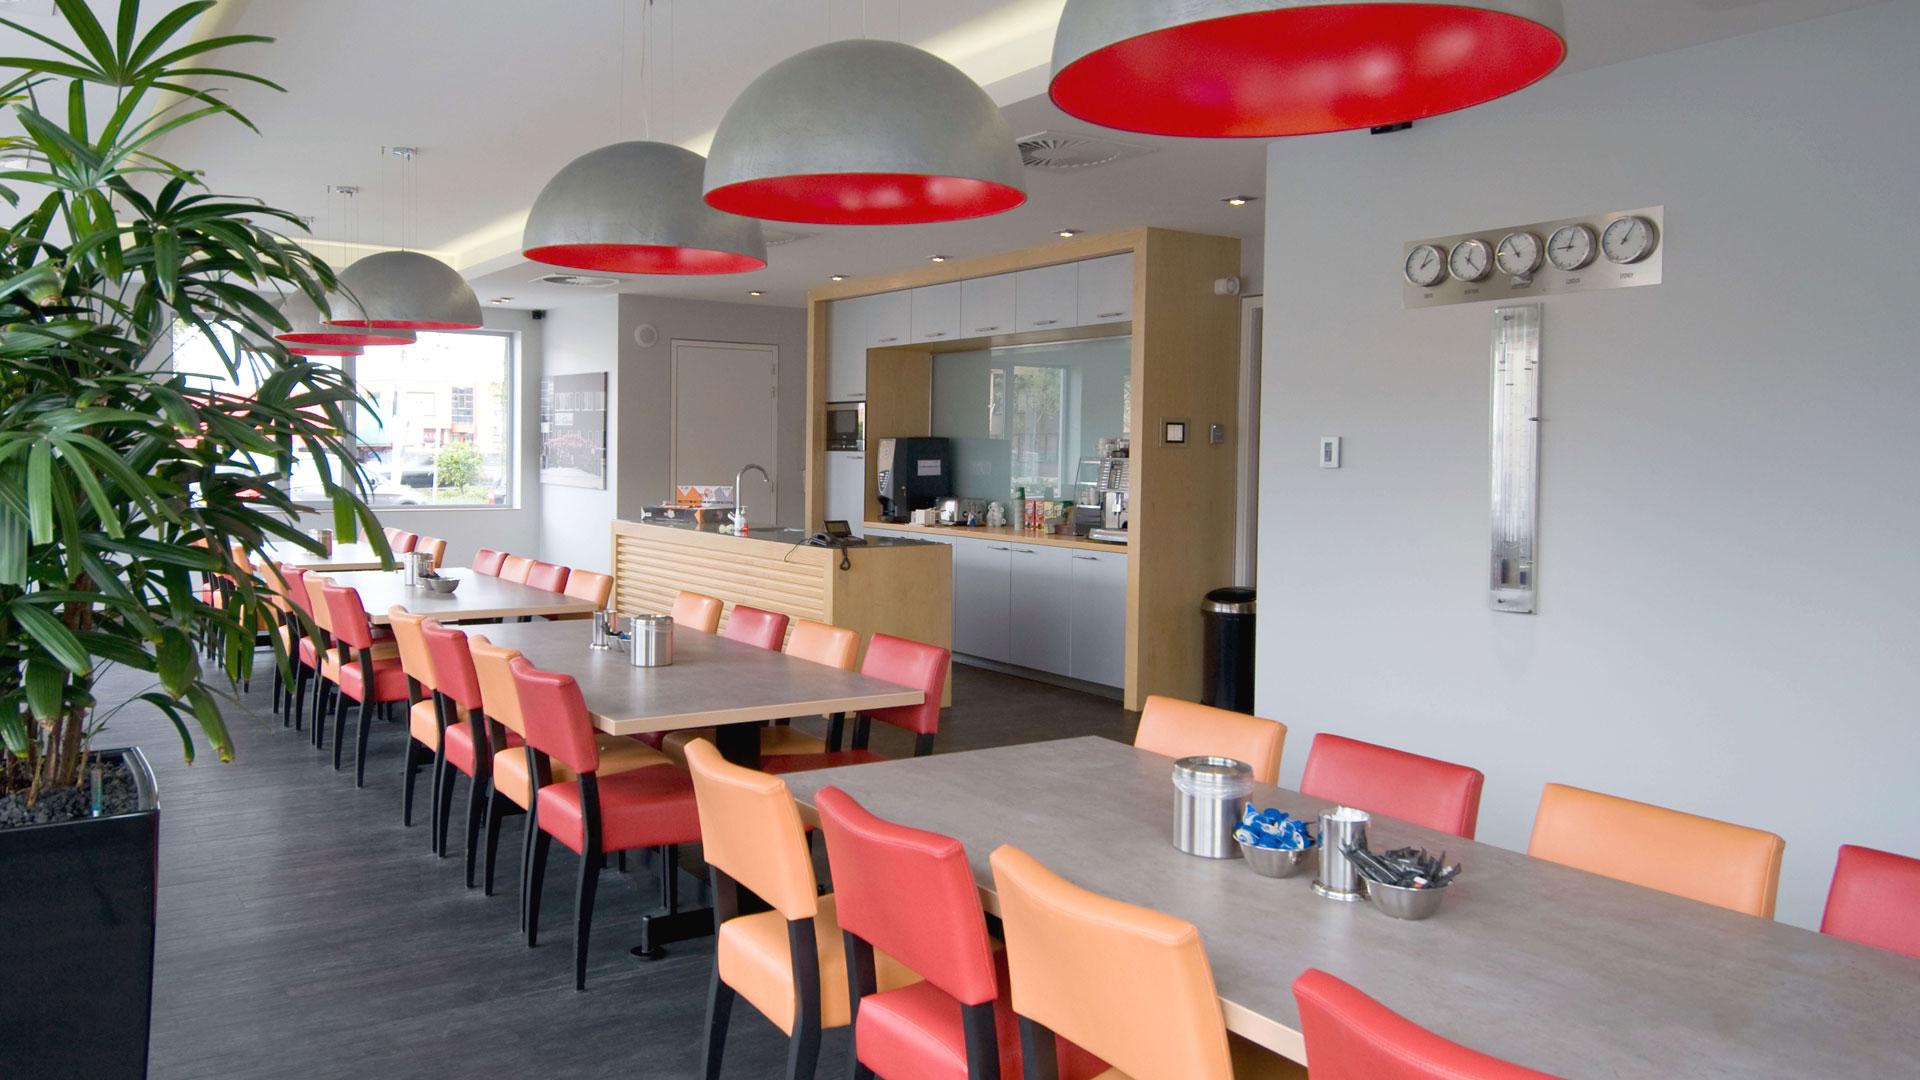 4300-Volendam-Cas-Sombroek-088-interieur-kantine-web - Bureau Bos